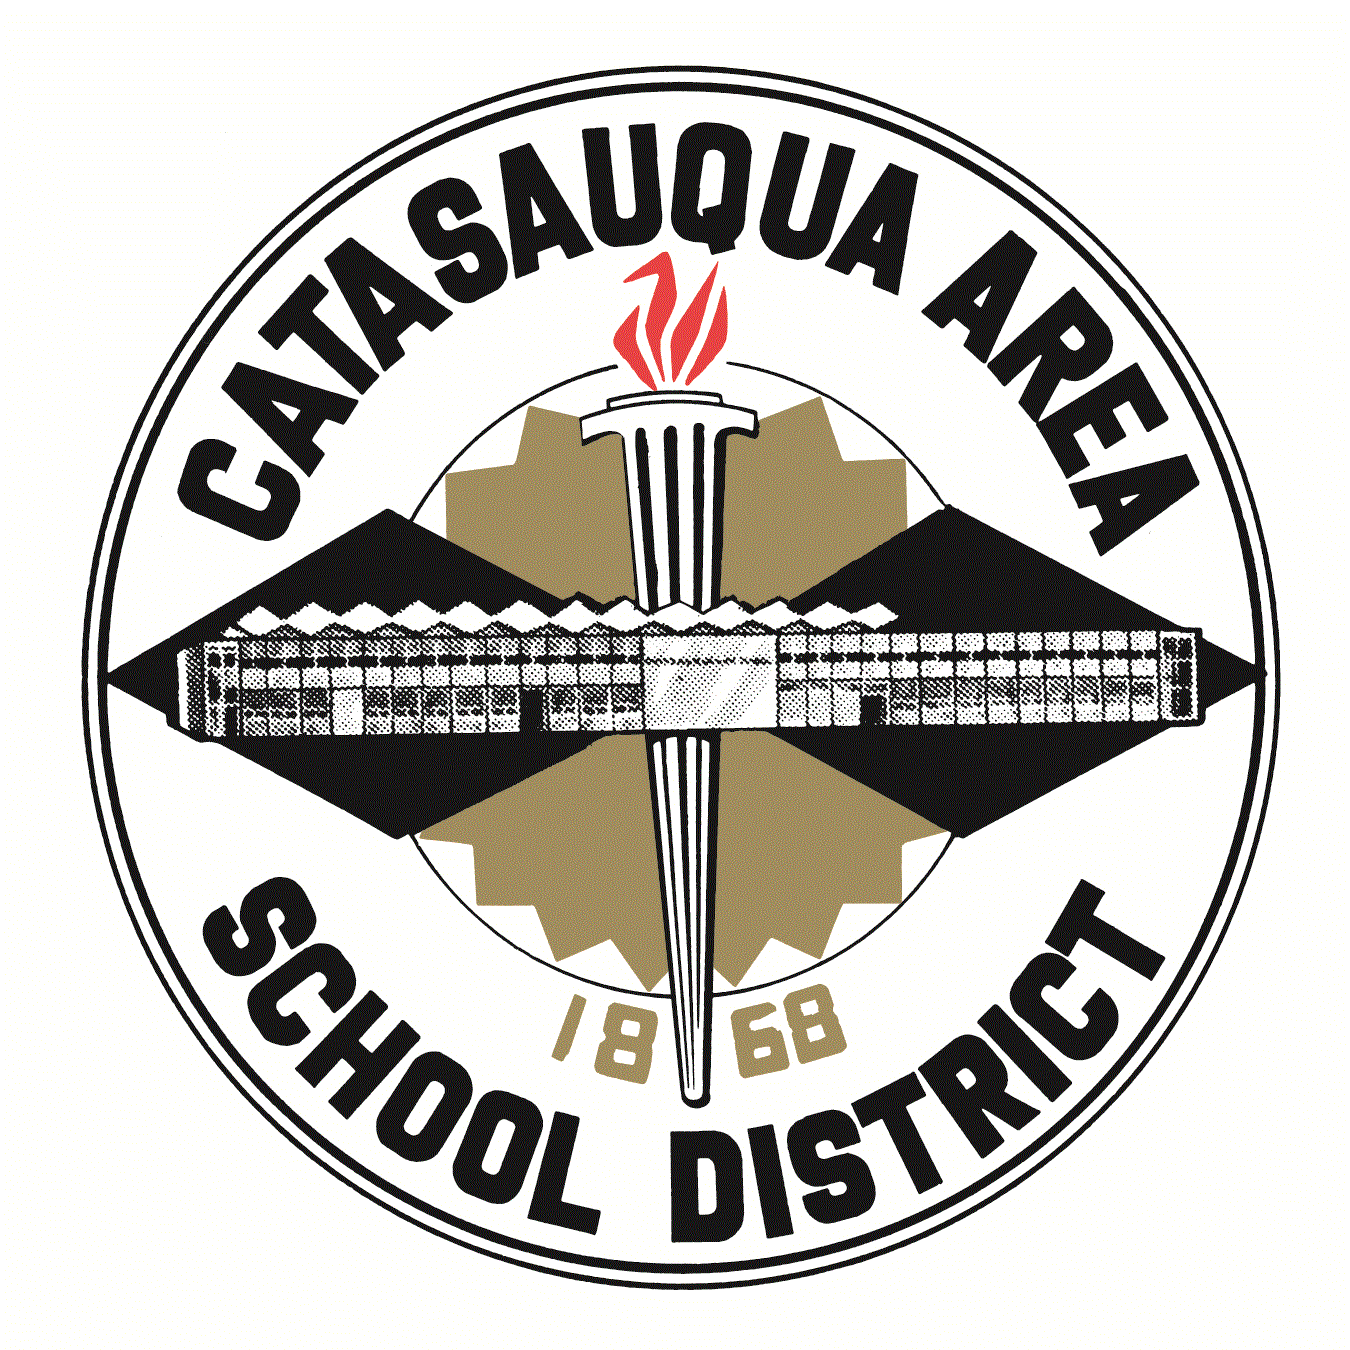 Catasauqua Area School District logo